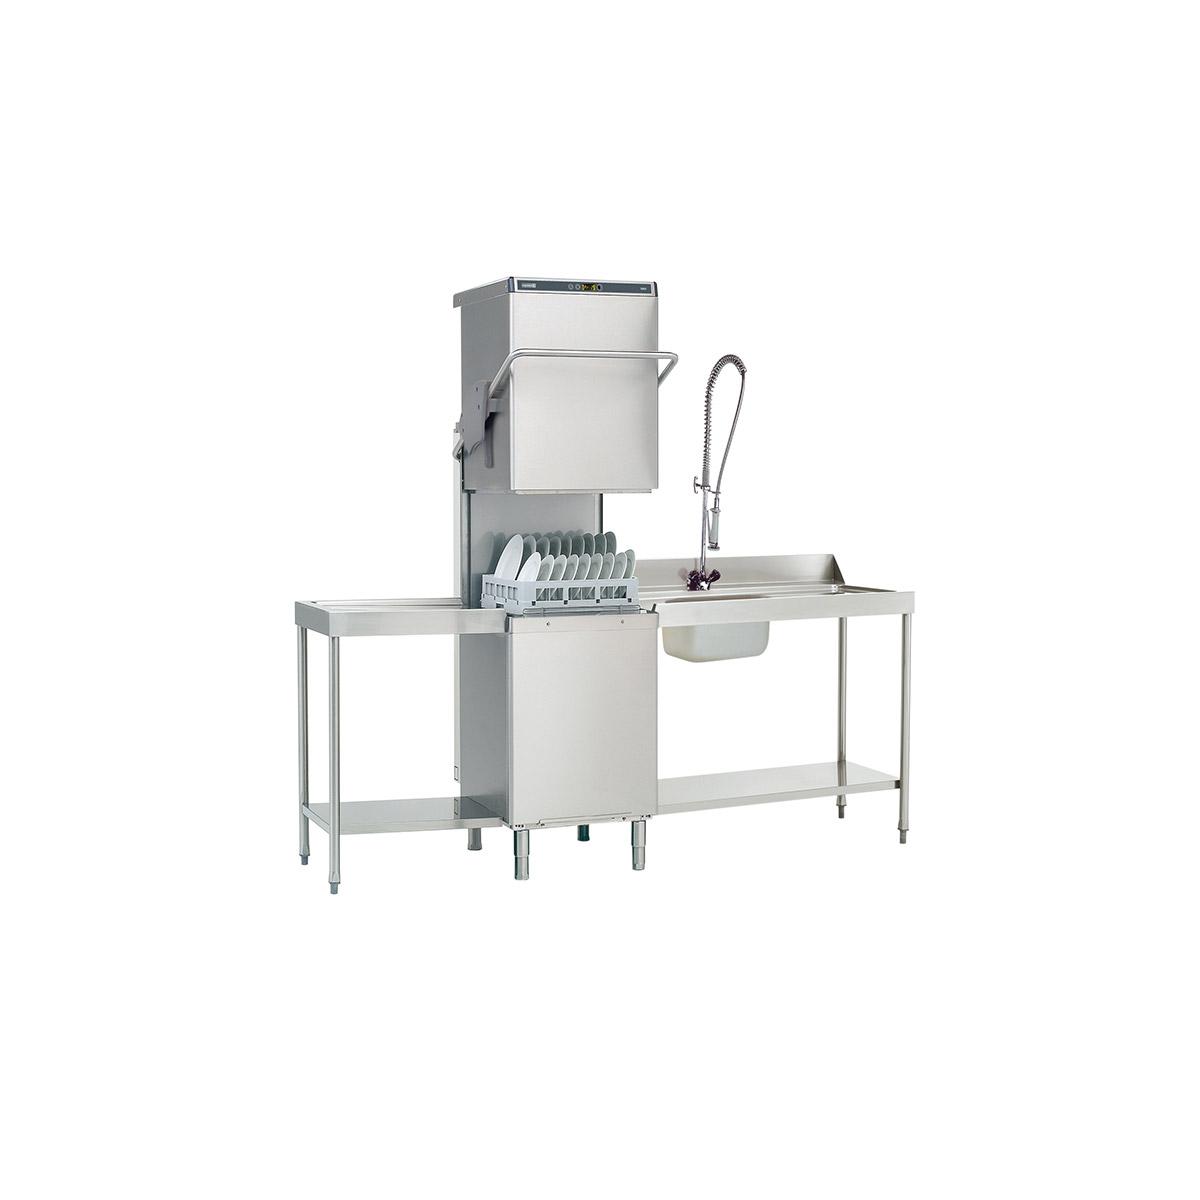 Maidaid Halcyon Passthrough Dishwasher D2021